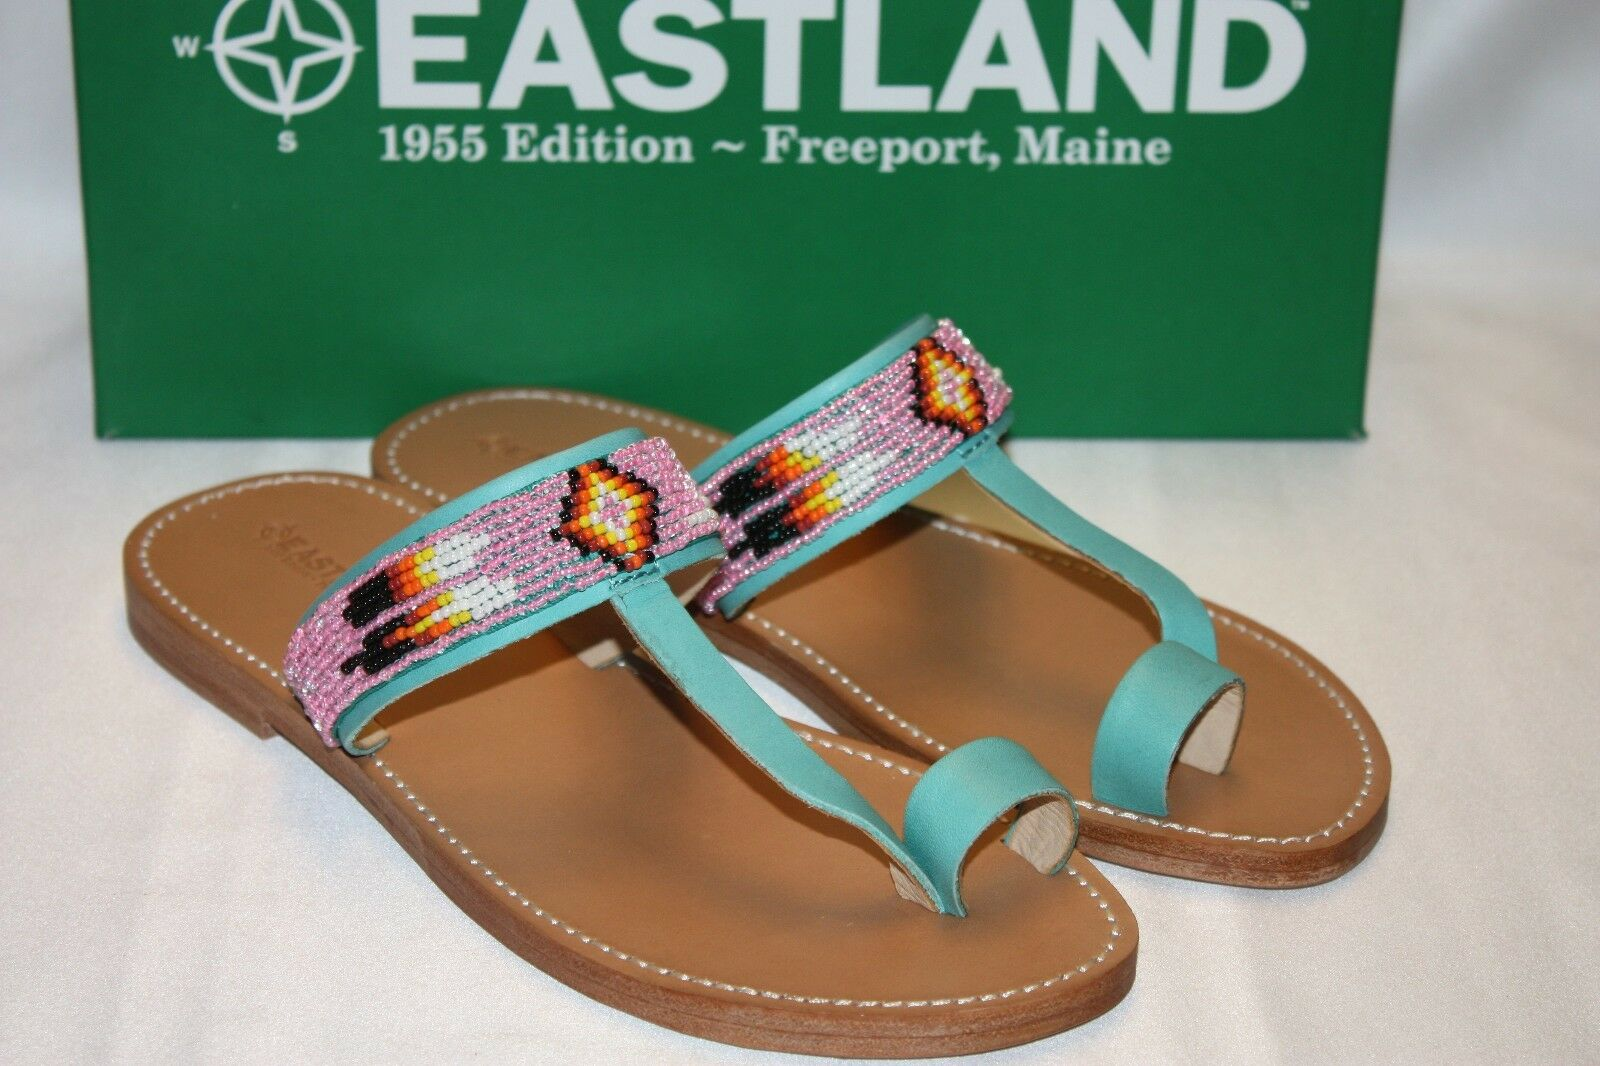 NEW NIB EASTLAND 1955 Ed HICKORY Aqua Beaded Leder Toe Ring Sandale 6 9 10 155